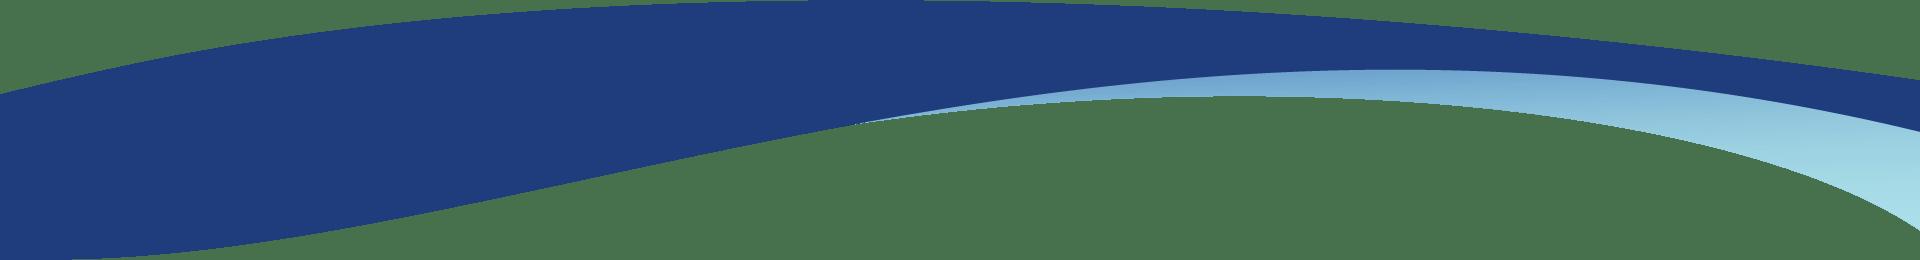 wave design 2